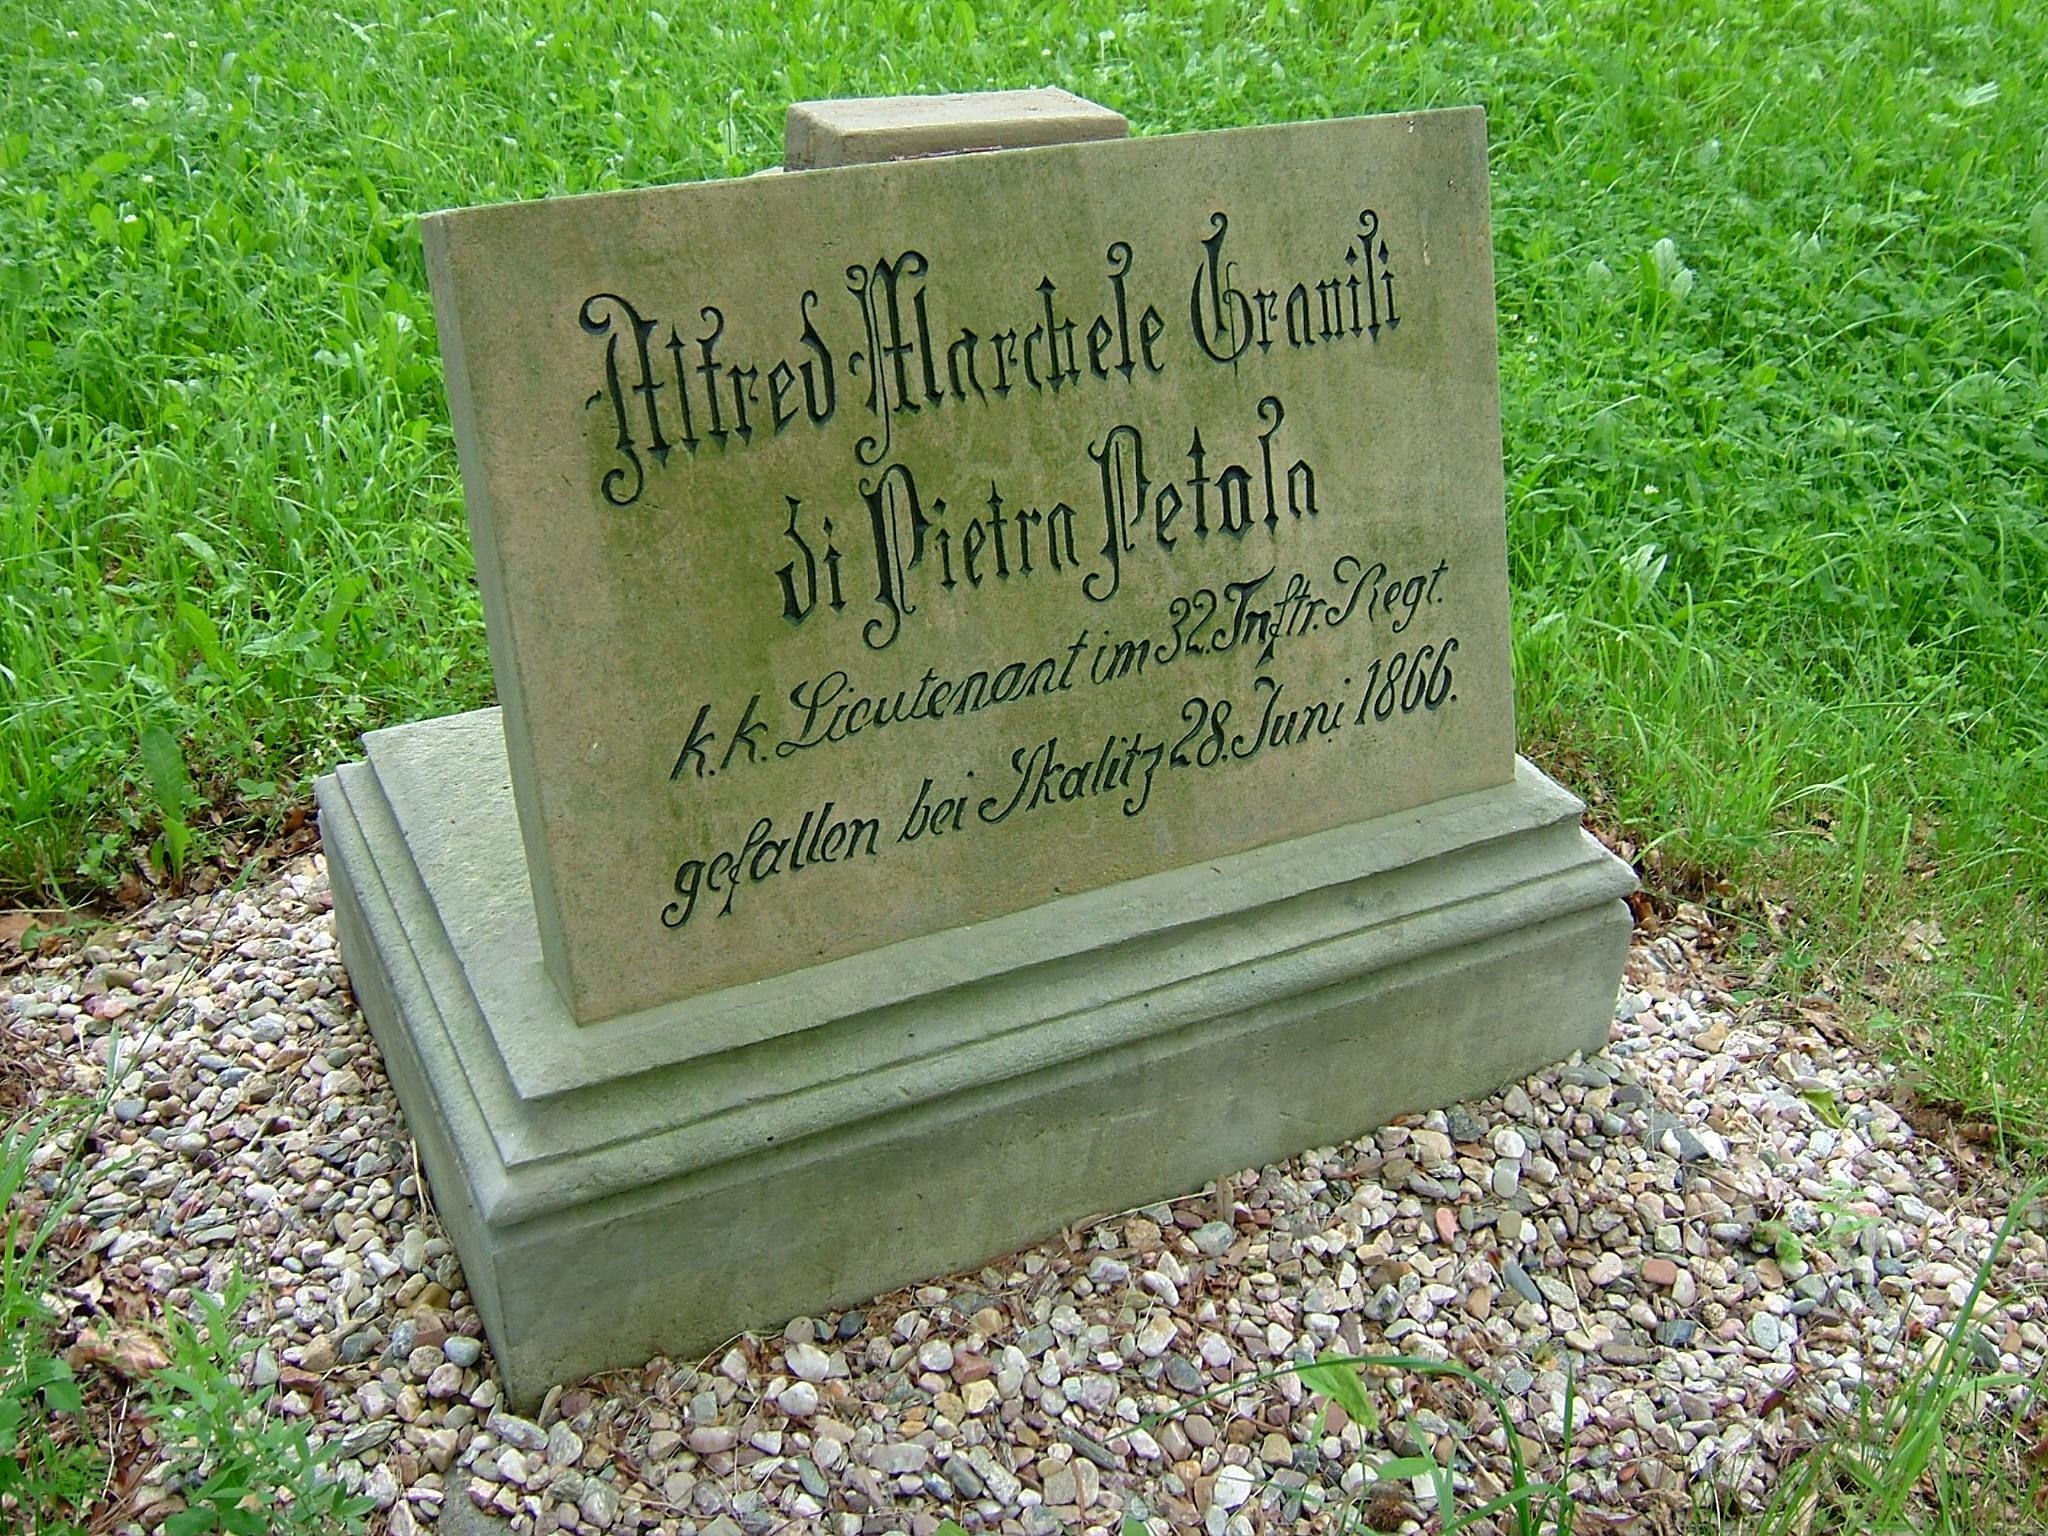 Rakouský podporučík Alfred marchese von Gravisi di Pietra Pelasa